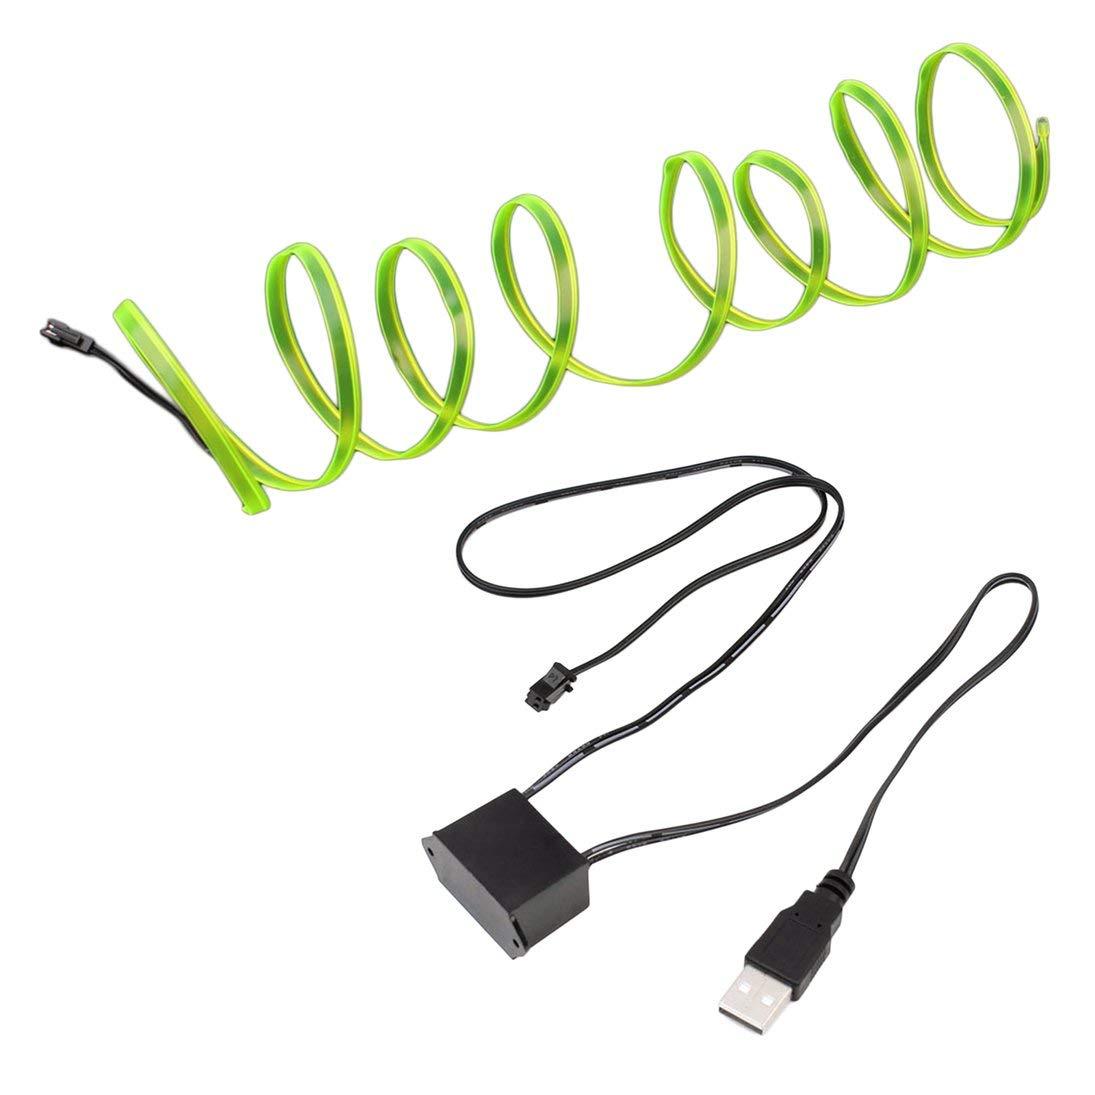 12V USB Drive Decorazione auto Car Styling Decor per feste HAHA LED EL Light Neon Rope Car Dance Glow Light Strip Controller 3V